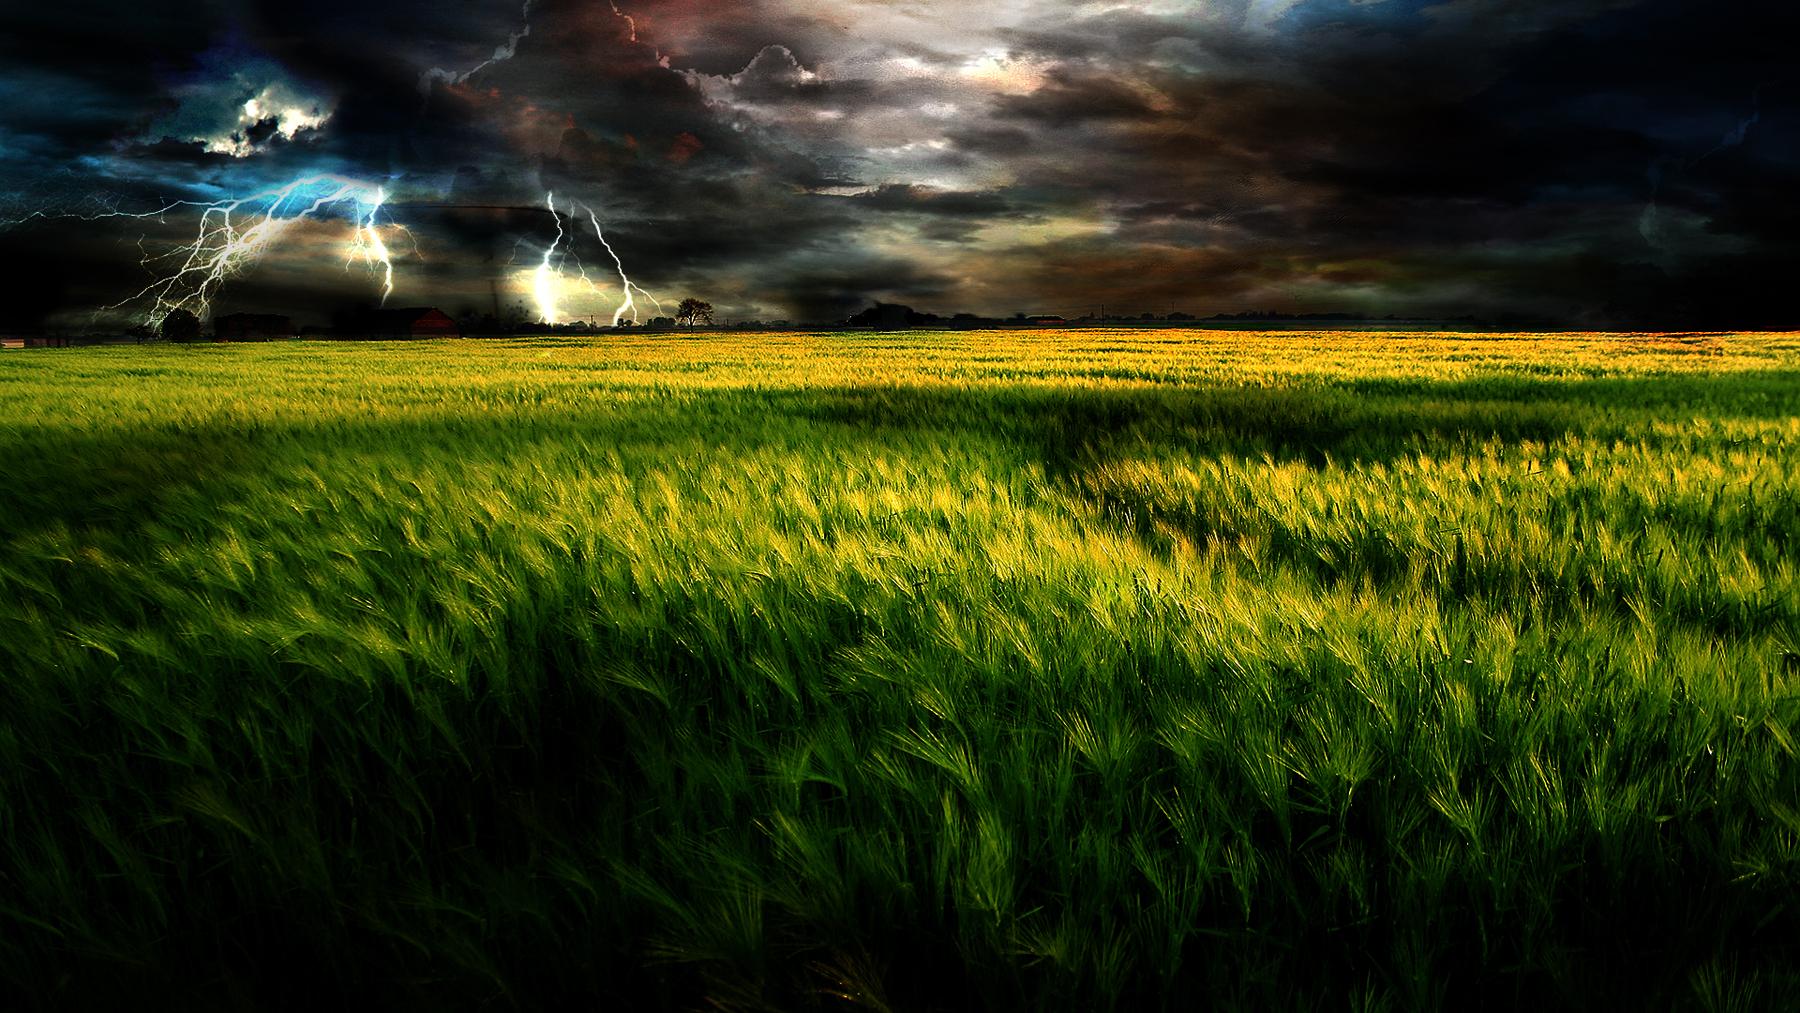 Best Wallpaper Night Grass - grass_field_by_lethalwire  Graphic-723655.jpg